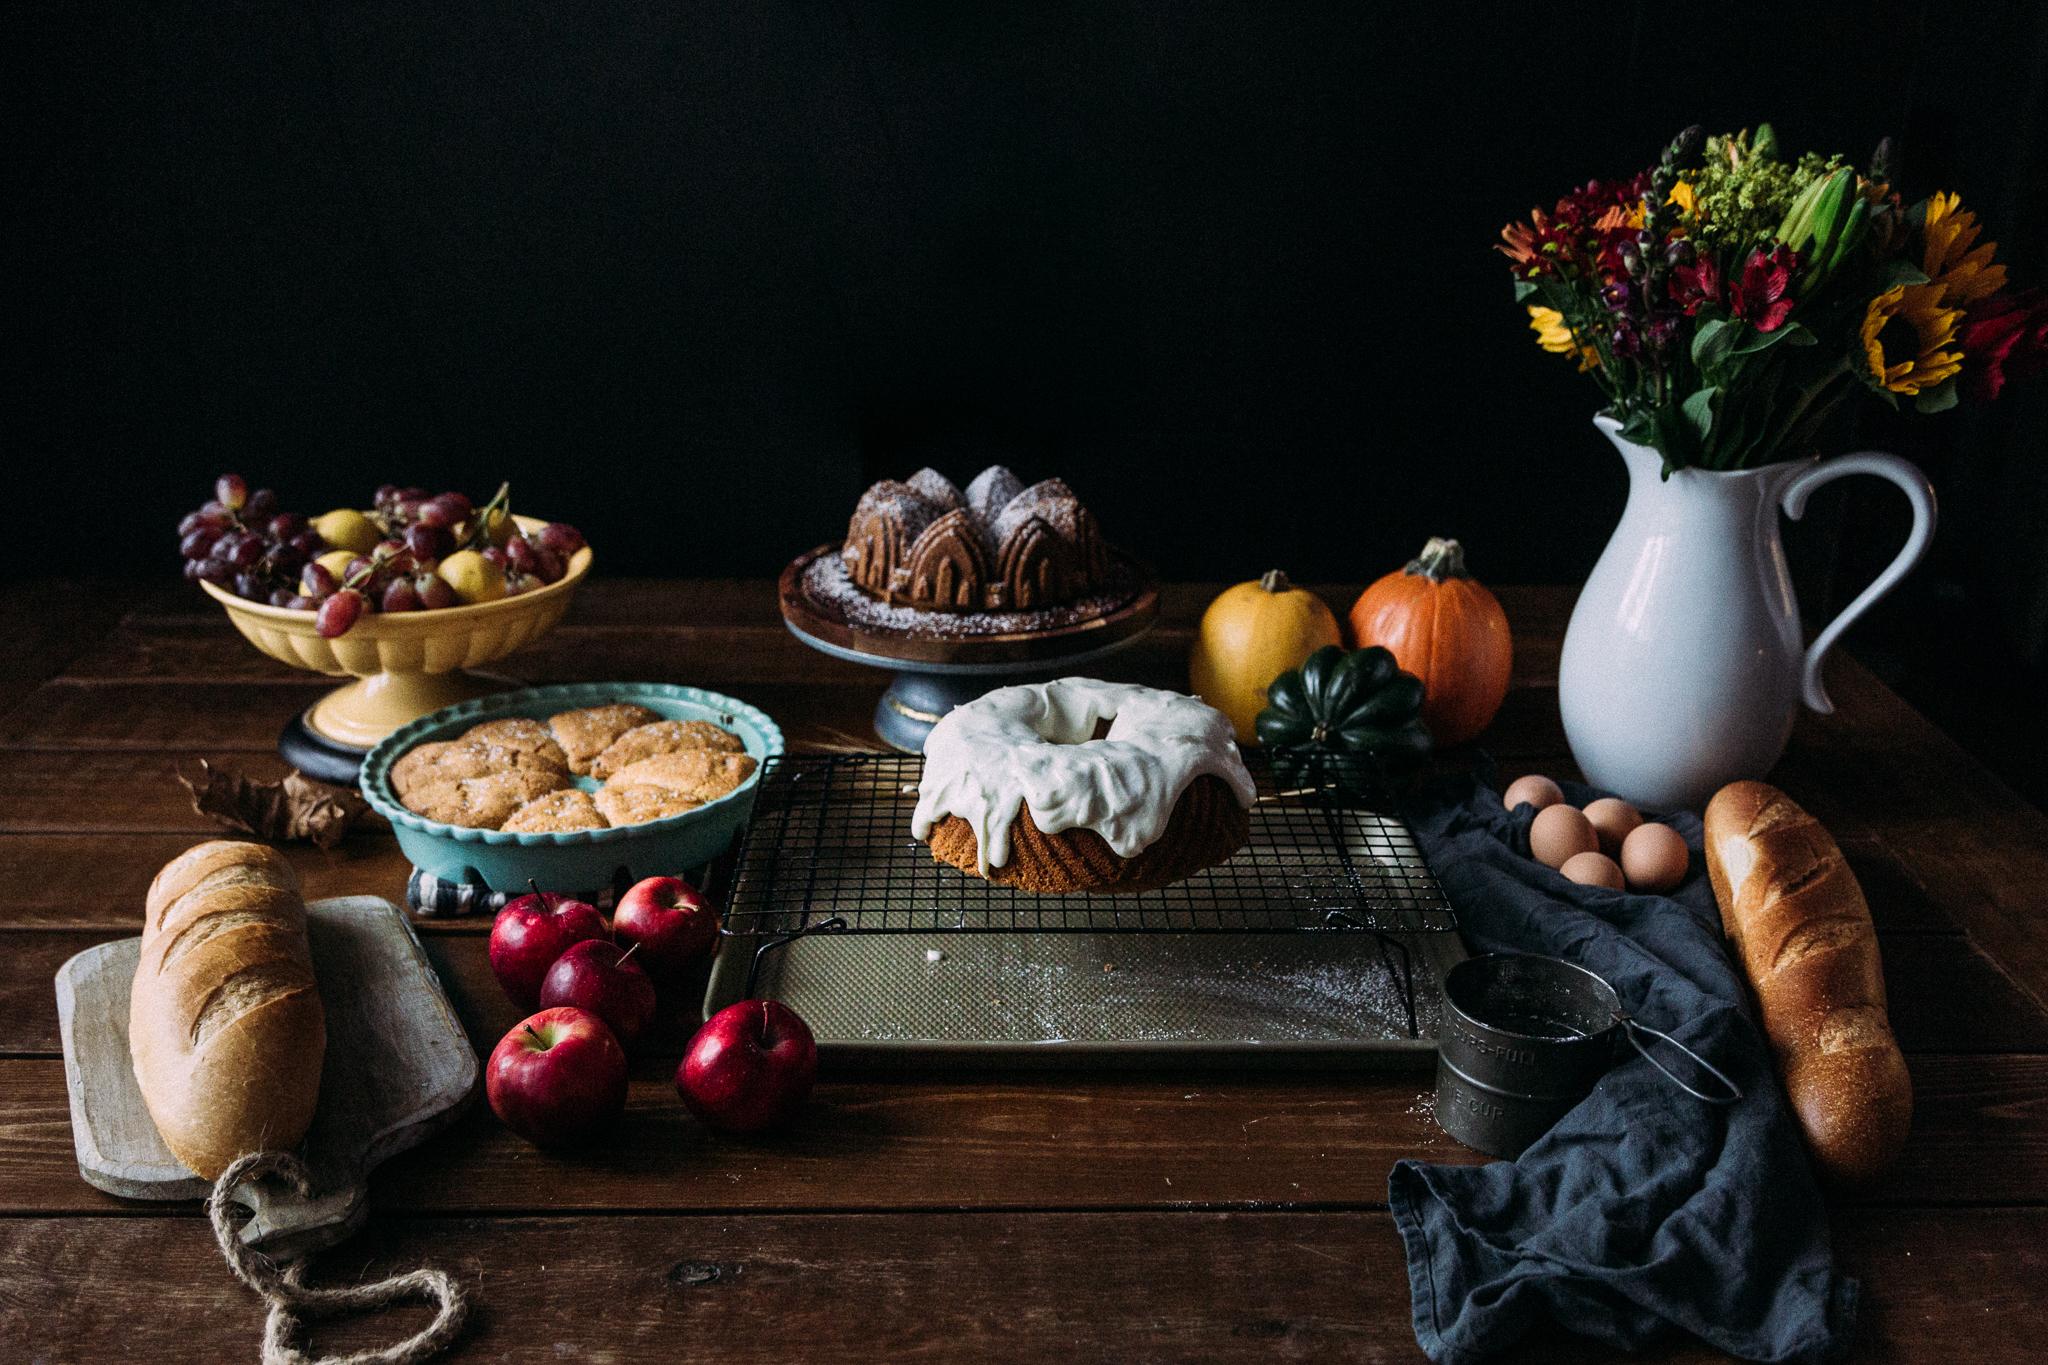 Fall On the table 1.jpg